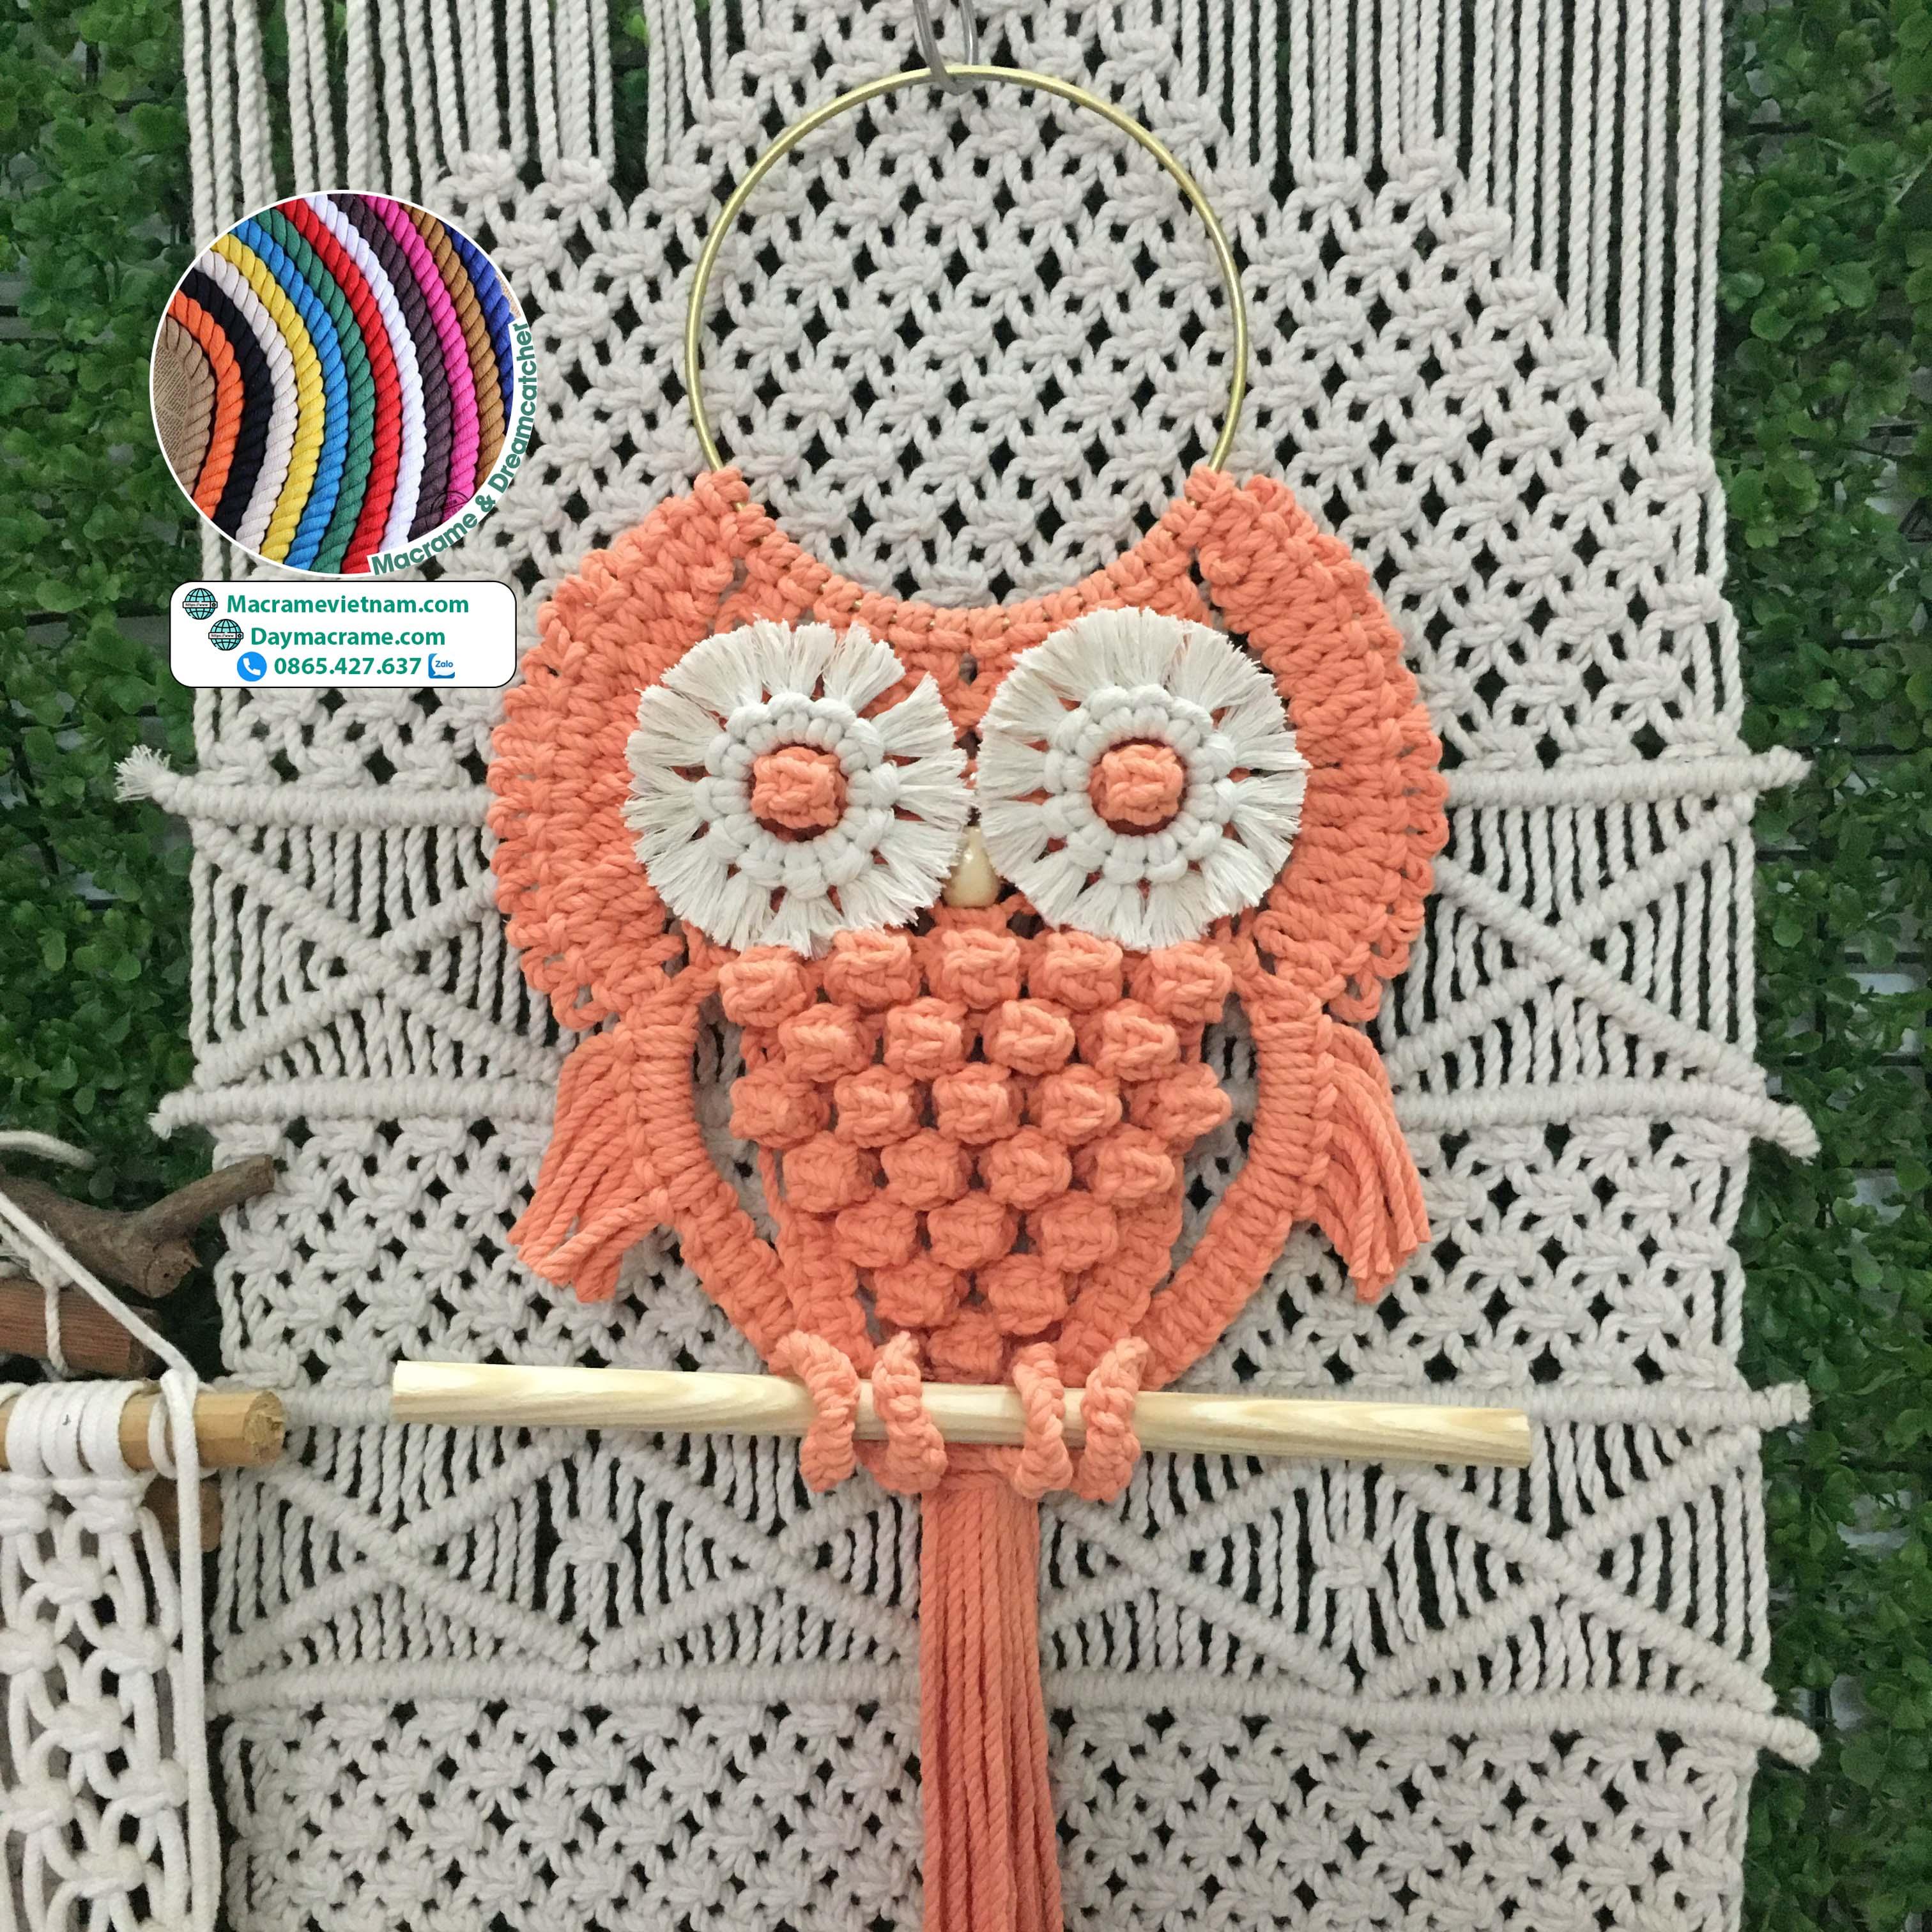 Cú macrame owl màu cam kích thước 20cmx50cm